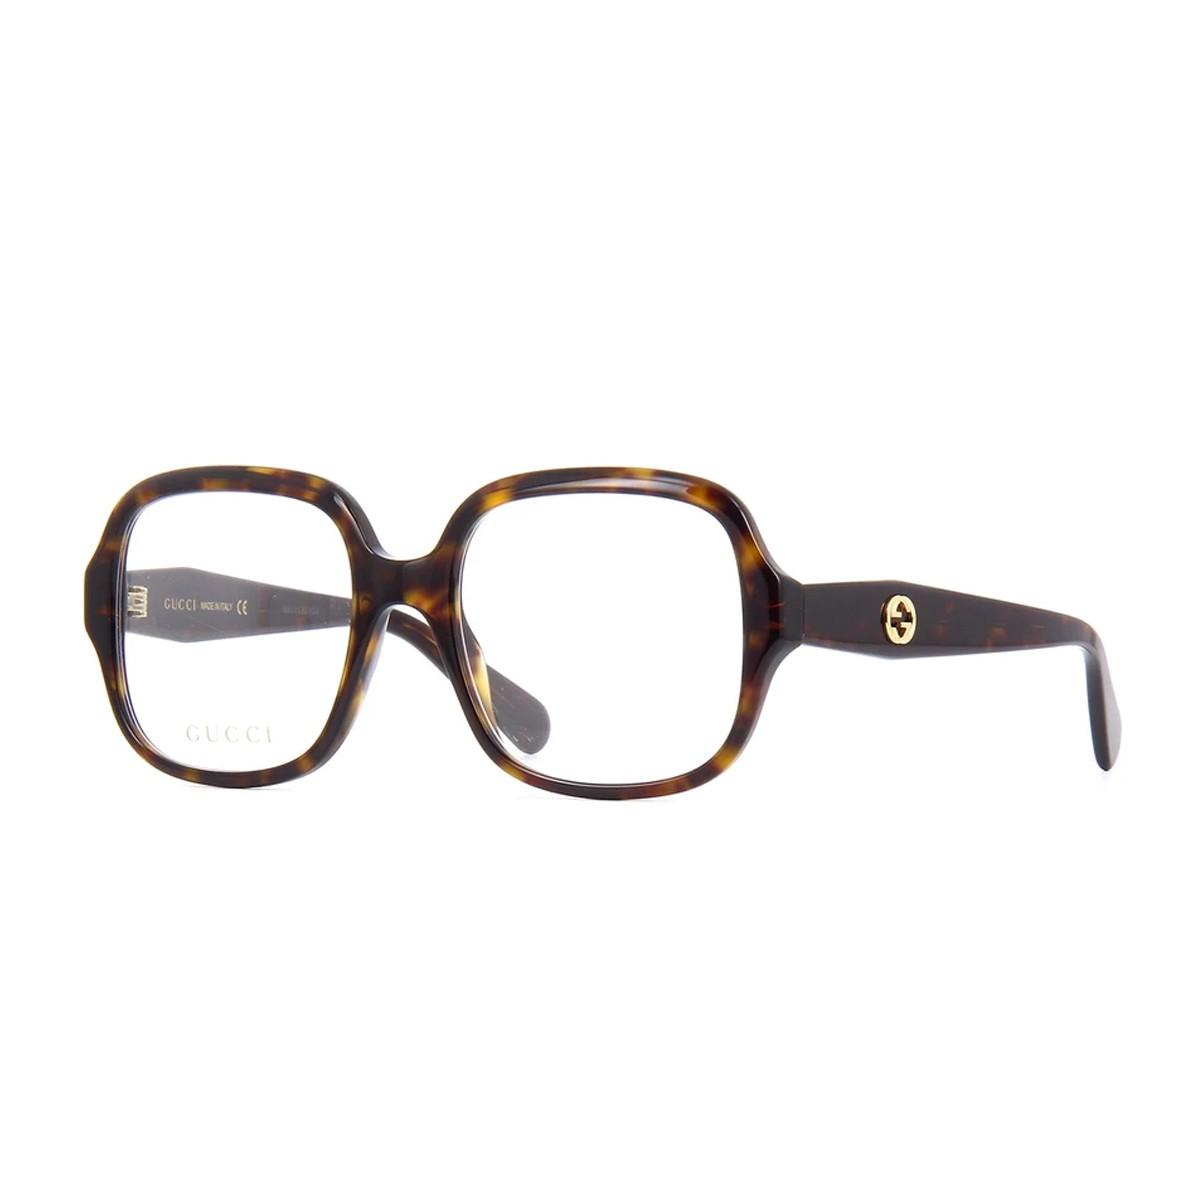 Gucci GG0799O | Women's eyeglasses